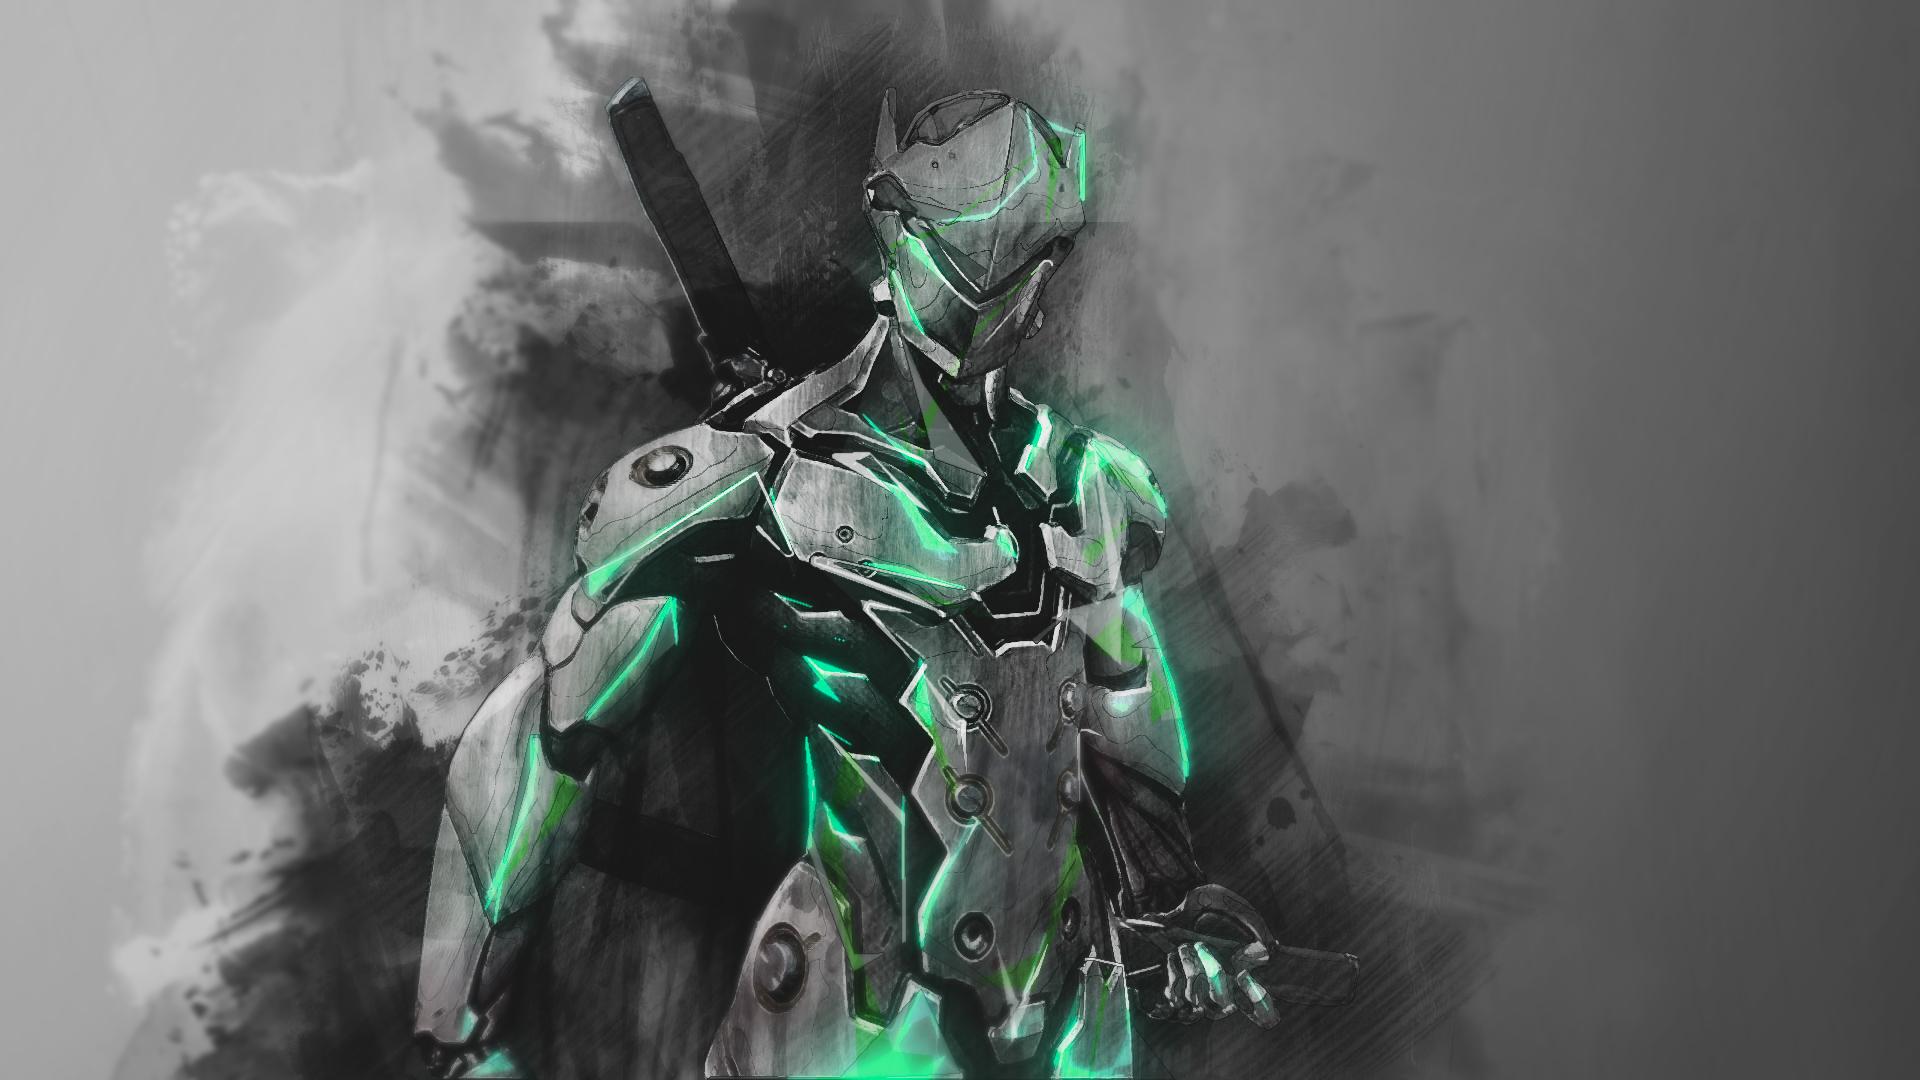 Overwatch Wallpaper By RaycoreTheCrawler On DeviantArt